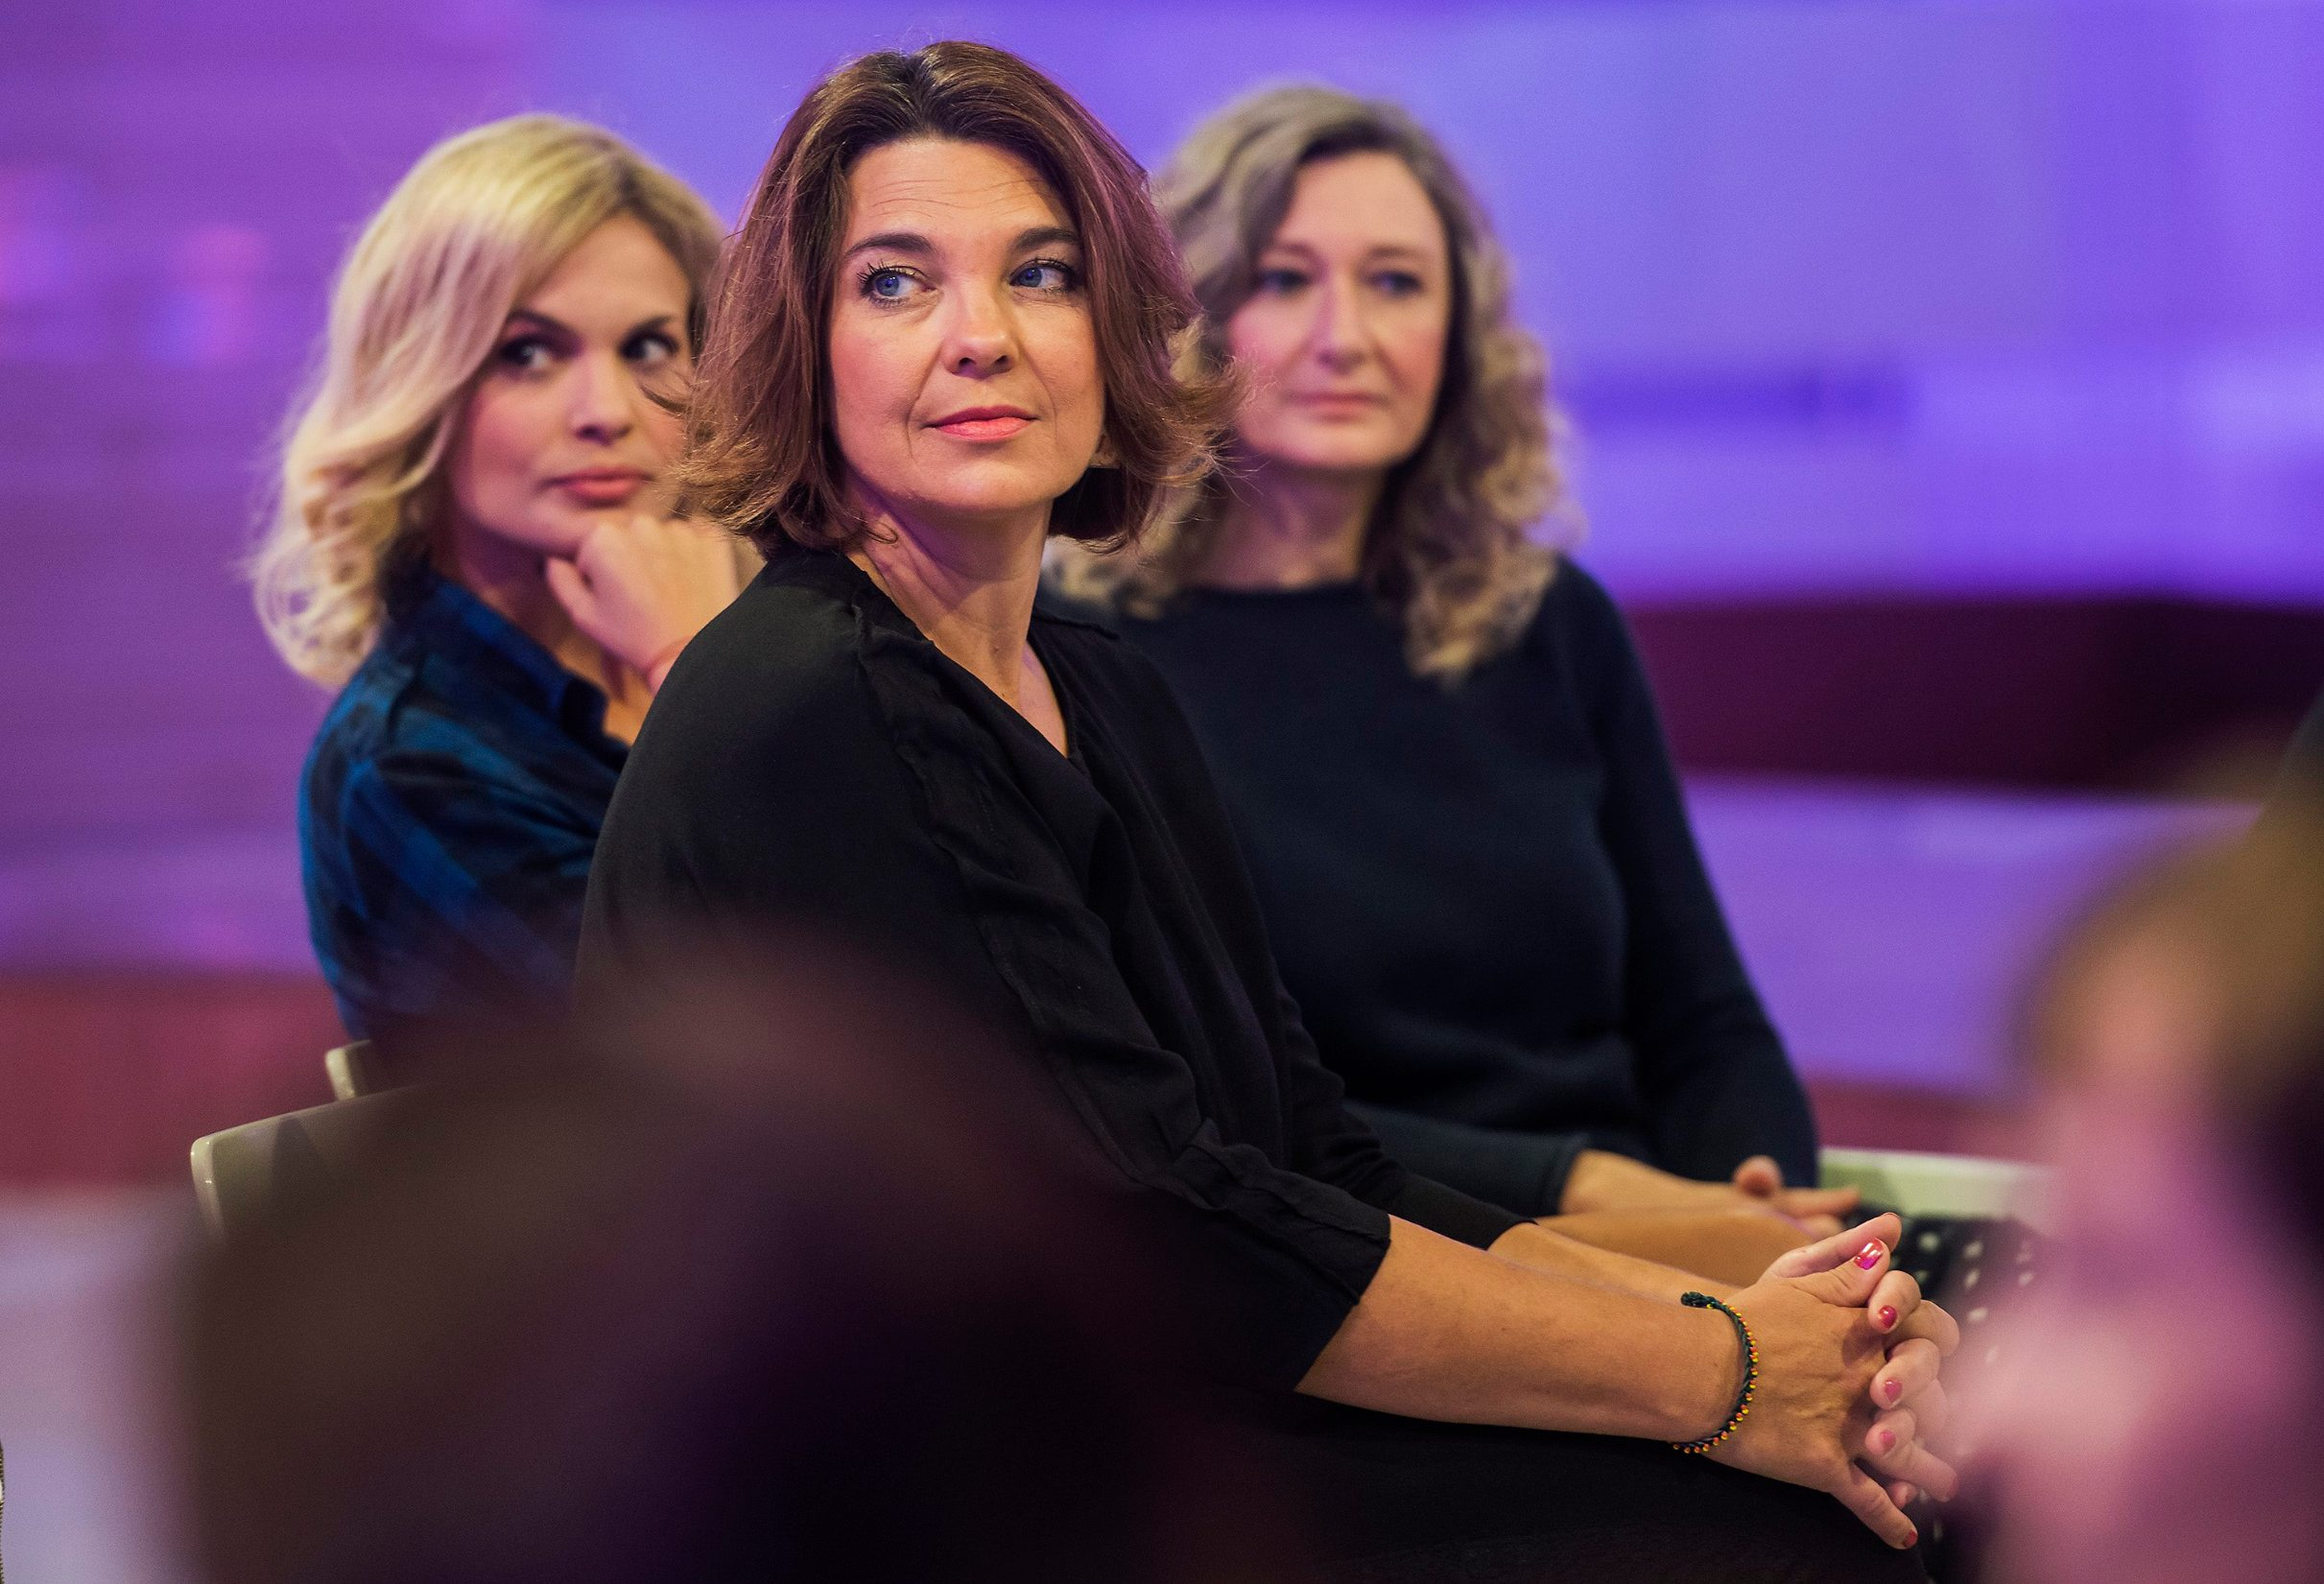 Zagreb, 100913. Na HRT-u je predstavljena jesenska shema programa. Na fotografiji: Nevena Rendeli, Karmela Vukov Colic i Vesna Karuza. Foto: Neja Markicevic / CROPIX